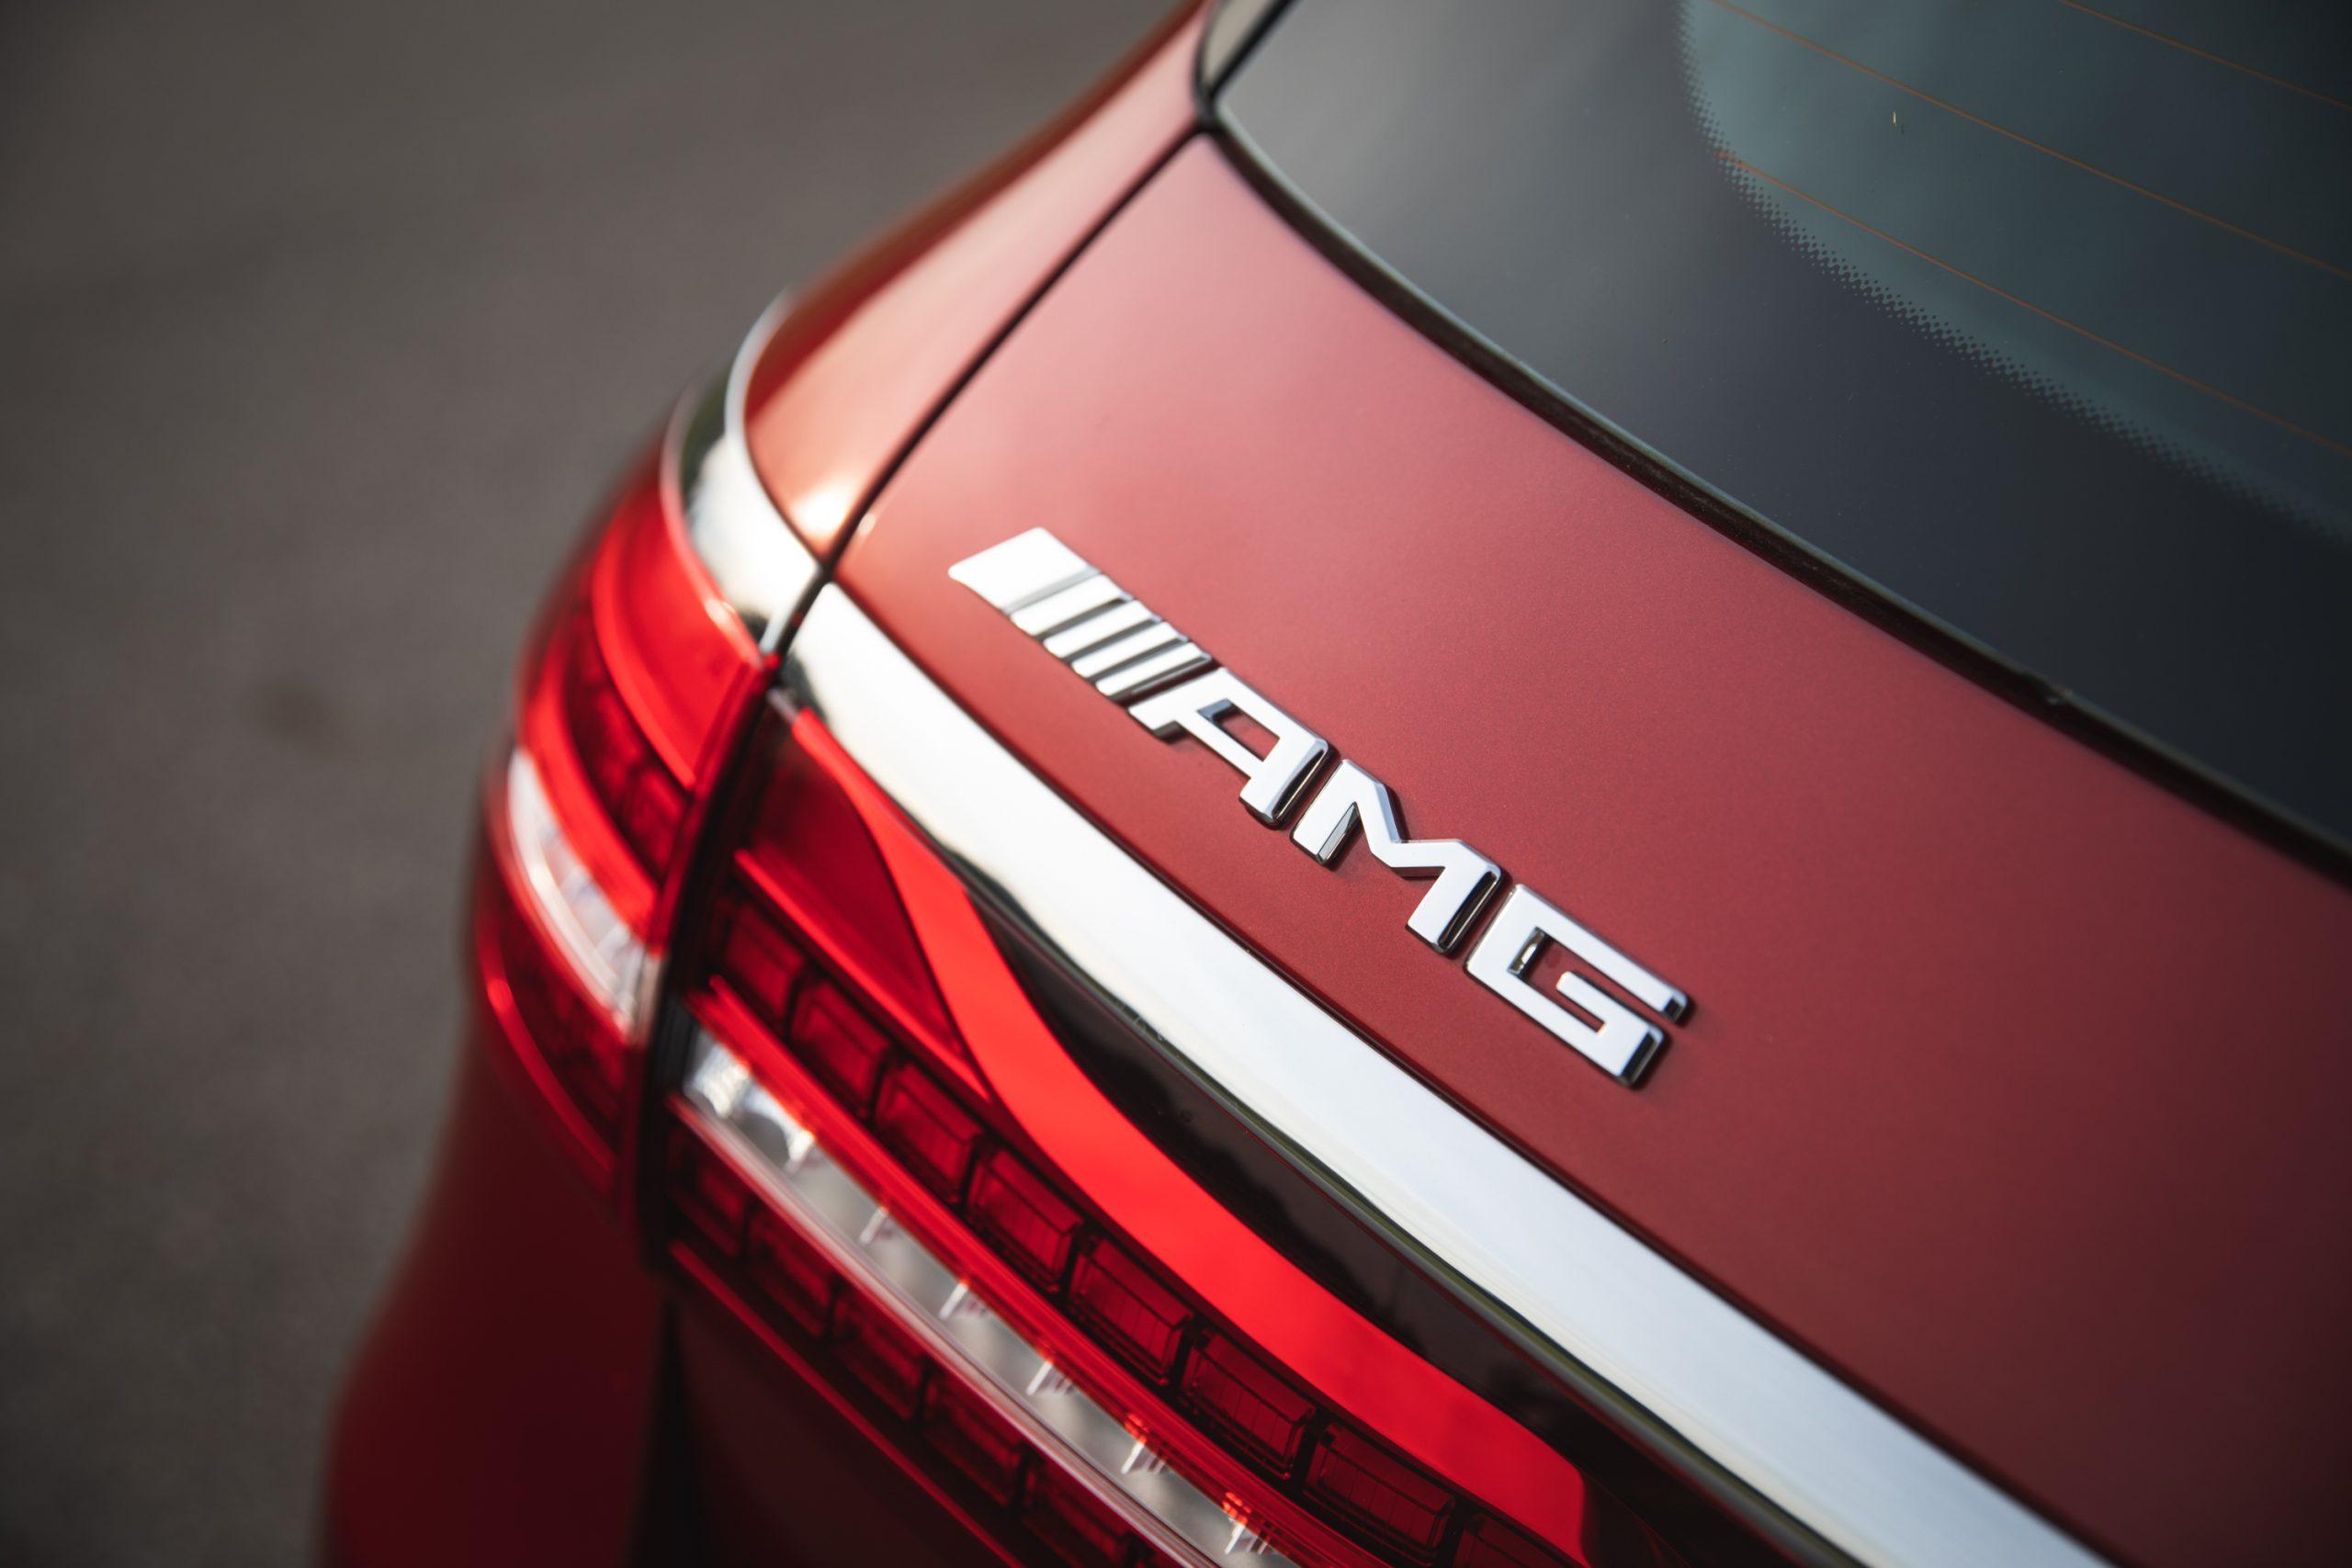 2021 Mercedes-AMG E63 S wagon rear badging